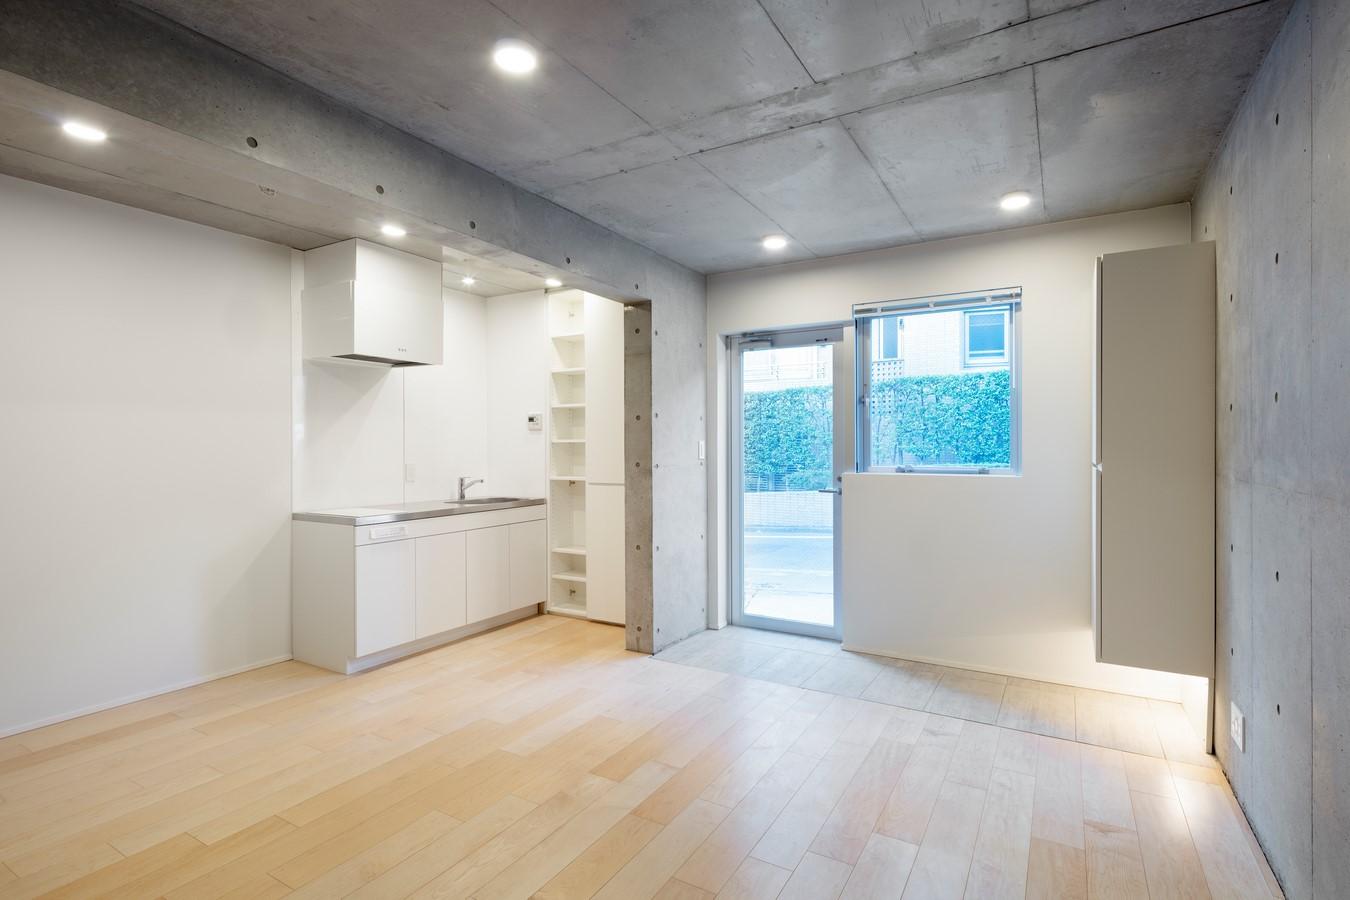 Daita by Sasaki Architecture - Sheet 1